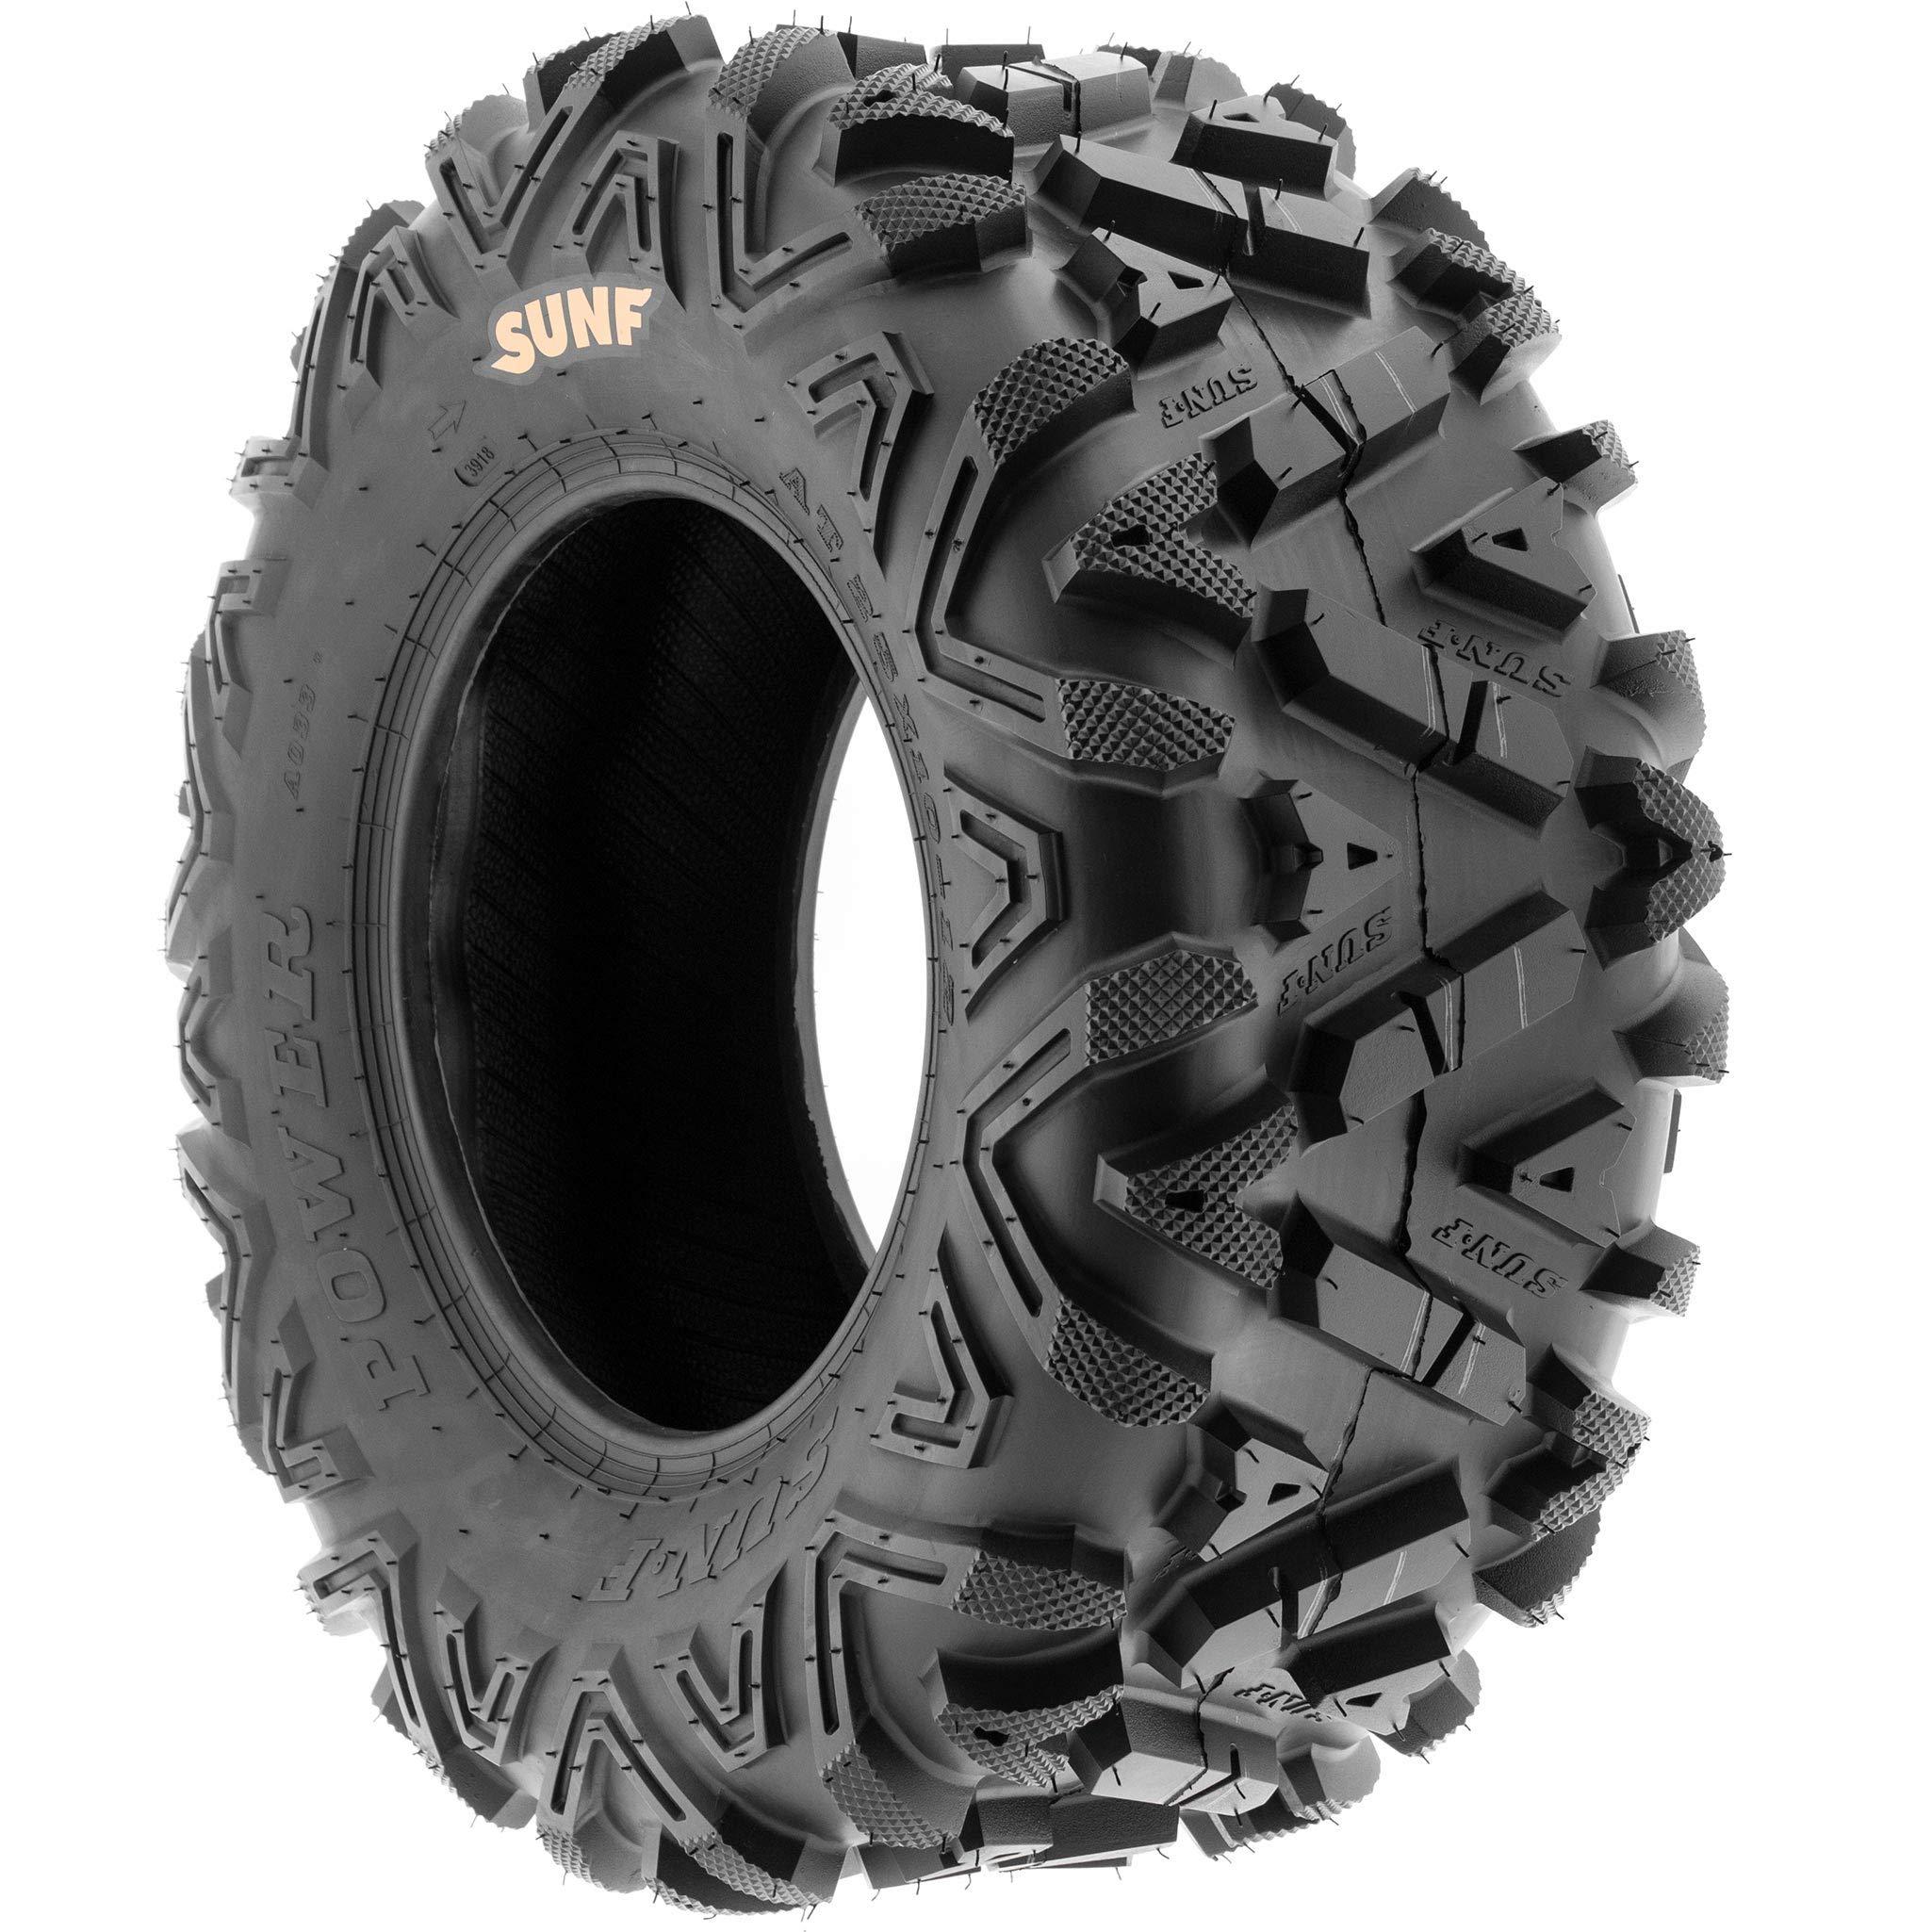 Set of 4 SunF Power.I ATV/UTV AT all-terrain Tires 24x8-11 Front & 24x11-10 Rear, 6 PR, Tubeless A033 by SUNF (Image #9)